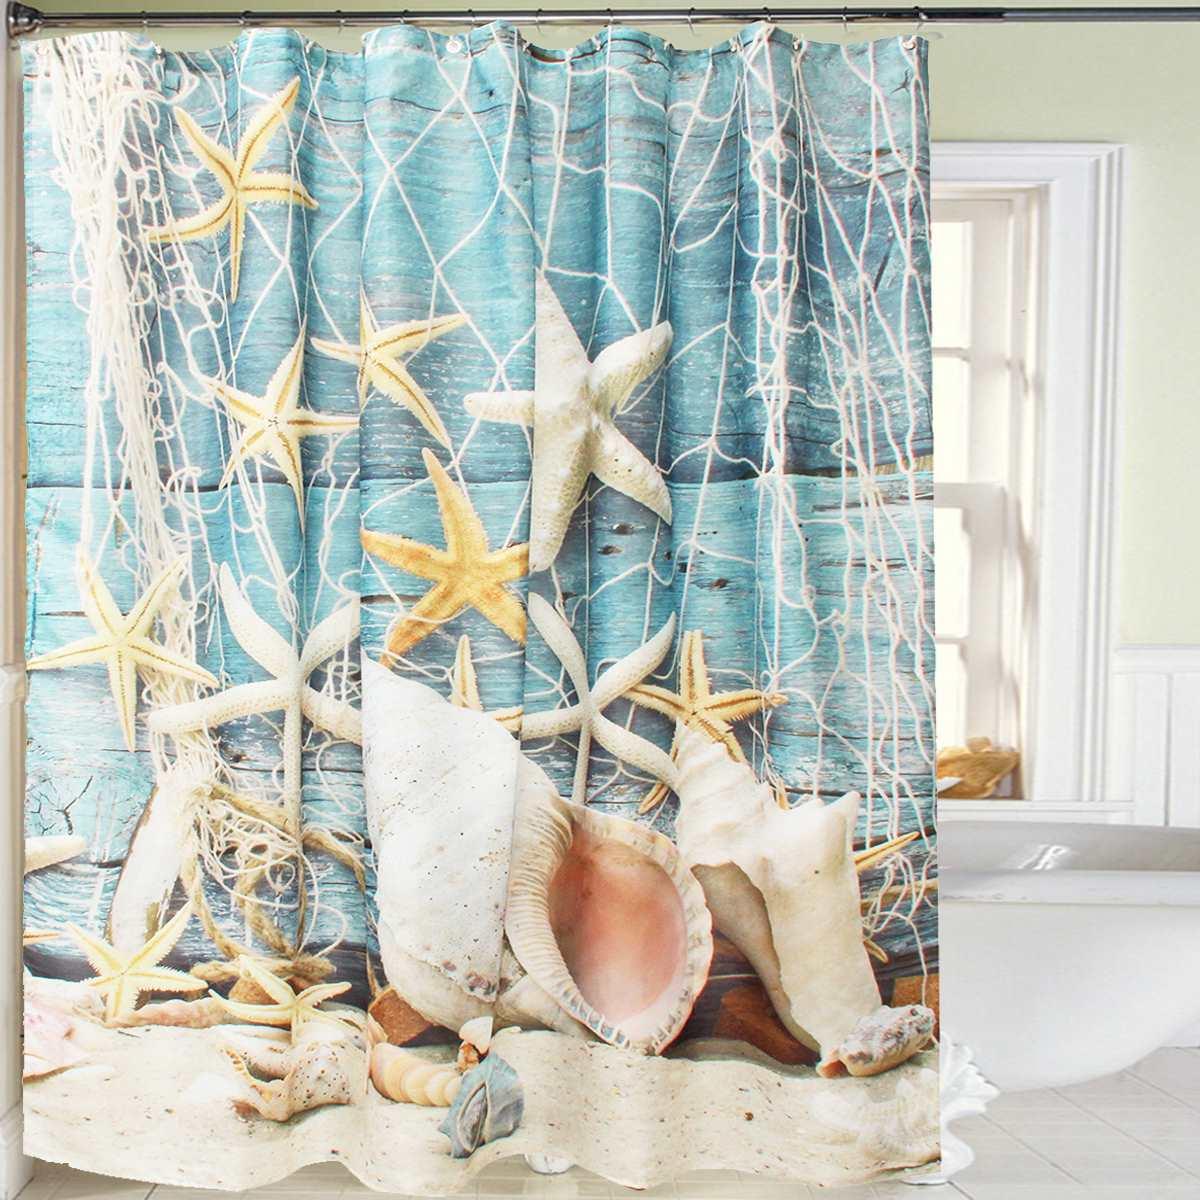 Sea Shower Curtain - Polyester fabric sea shell bathroom shower curtain waterproof sheer shower screen hooks household bathroom decoration 180x180cm